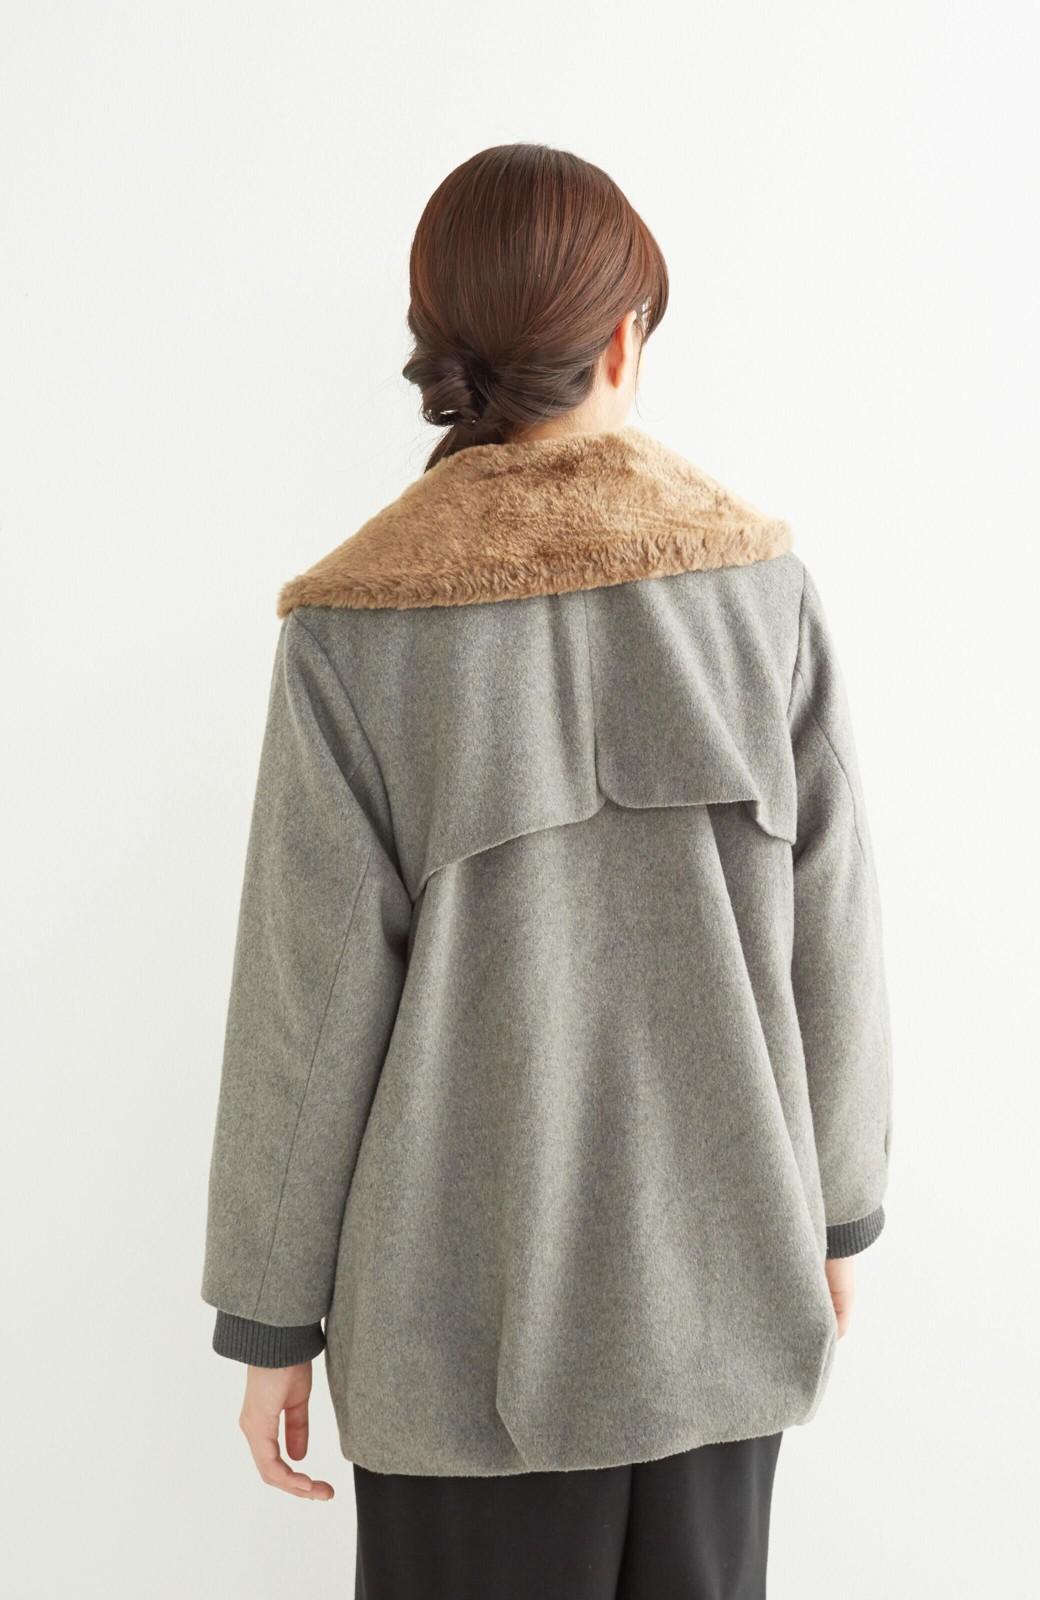 pilvee 取り外しフェイクファー衿付き ウール混のノーカラーコート <グレー>の商品写真18